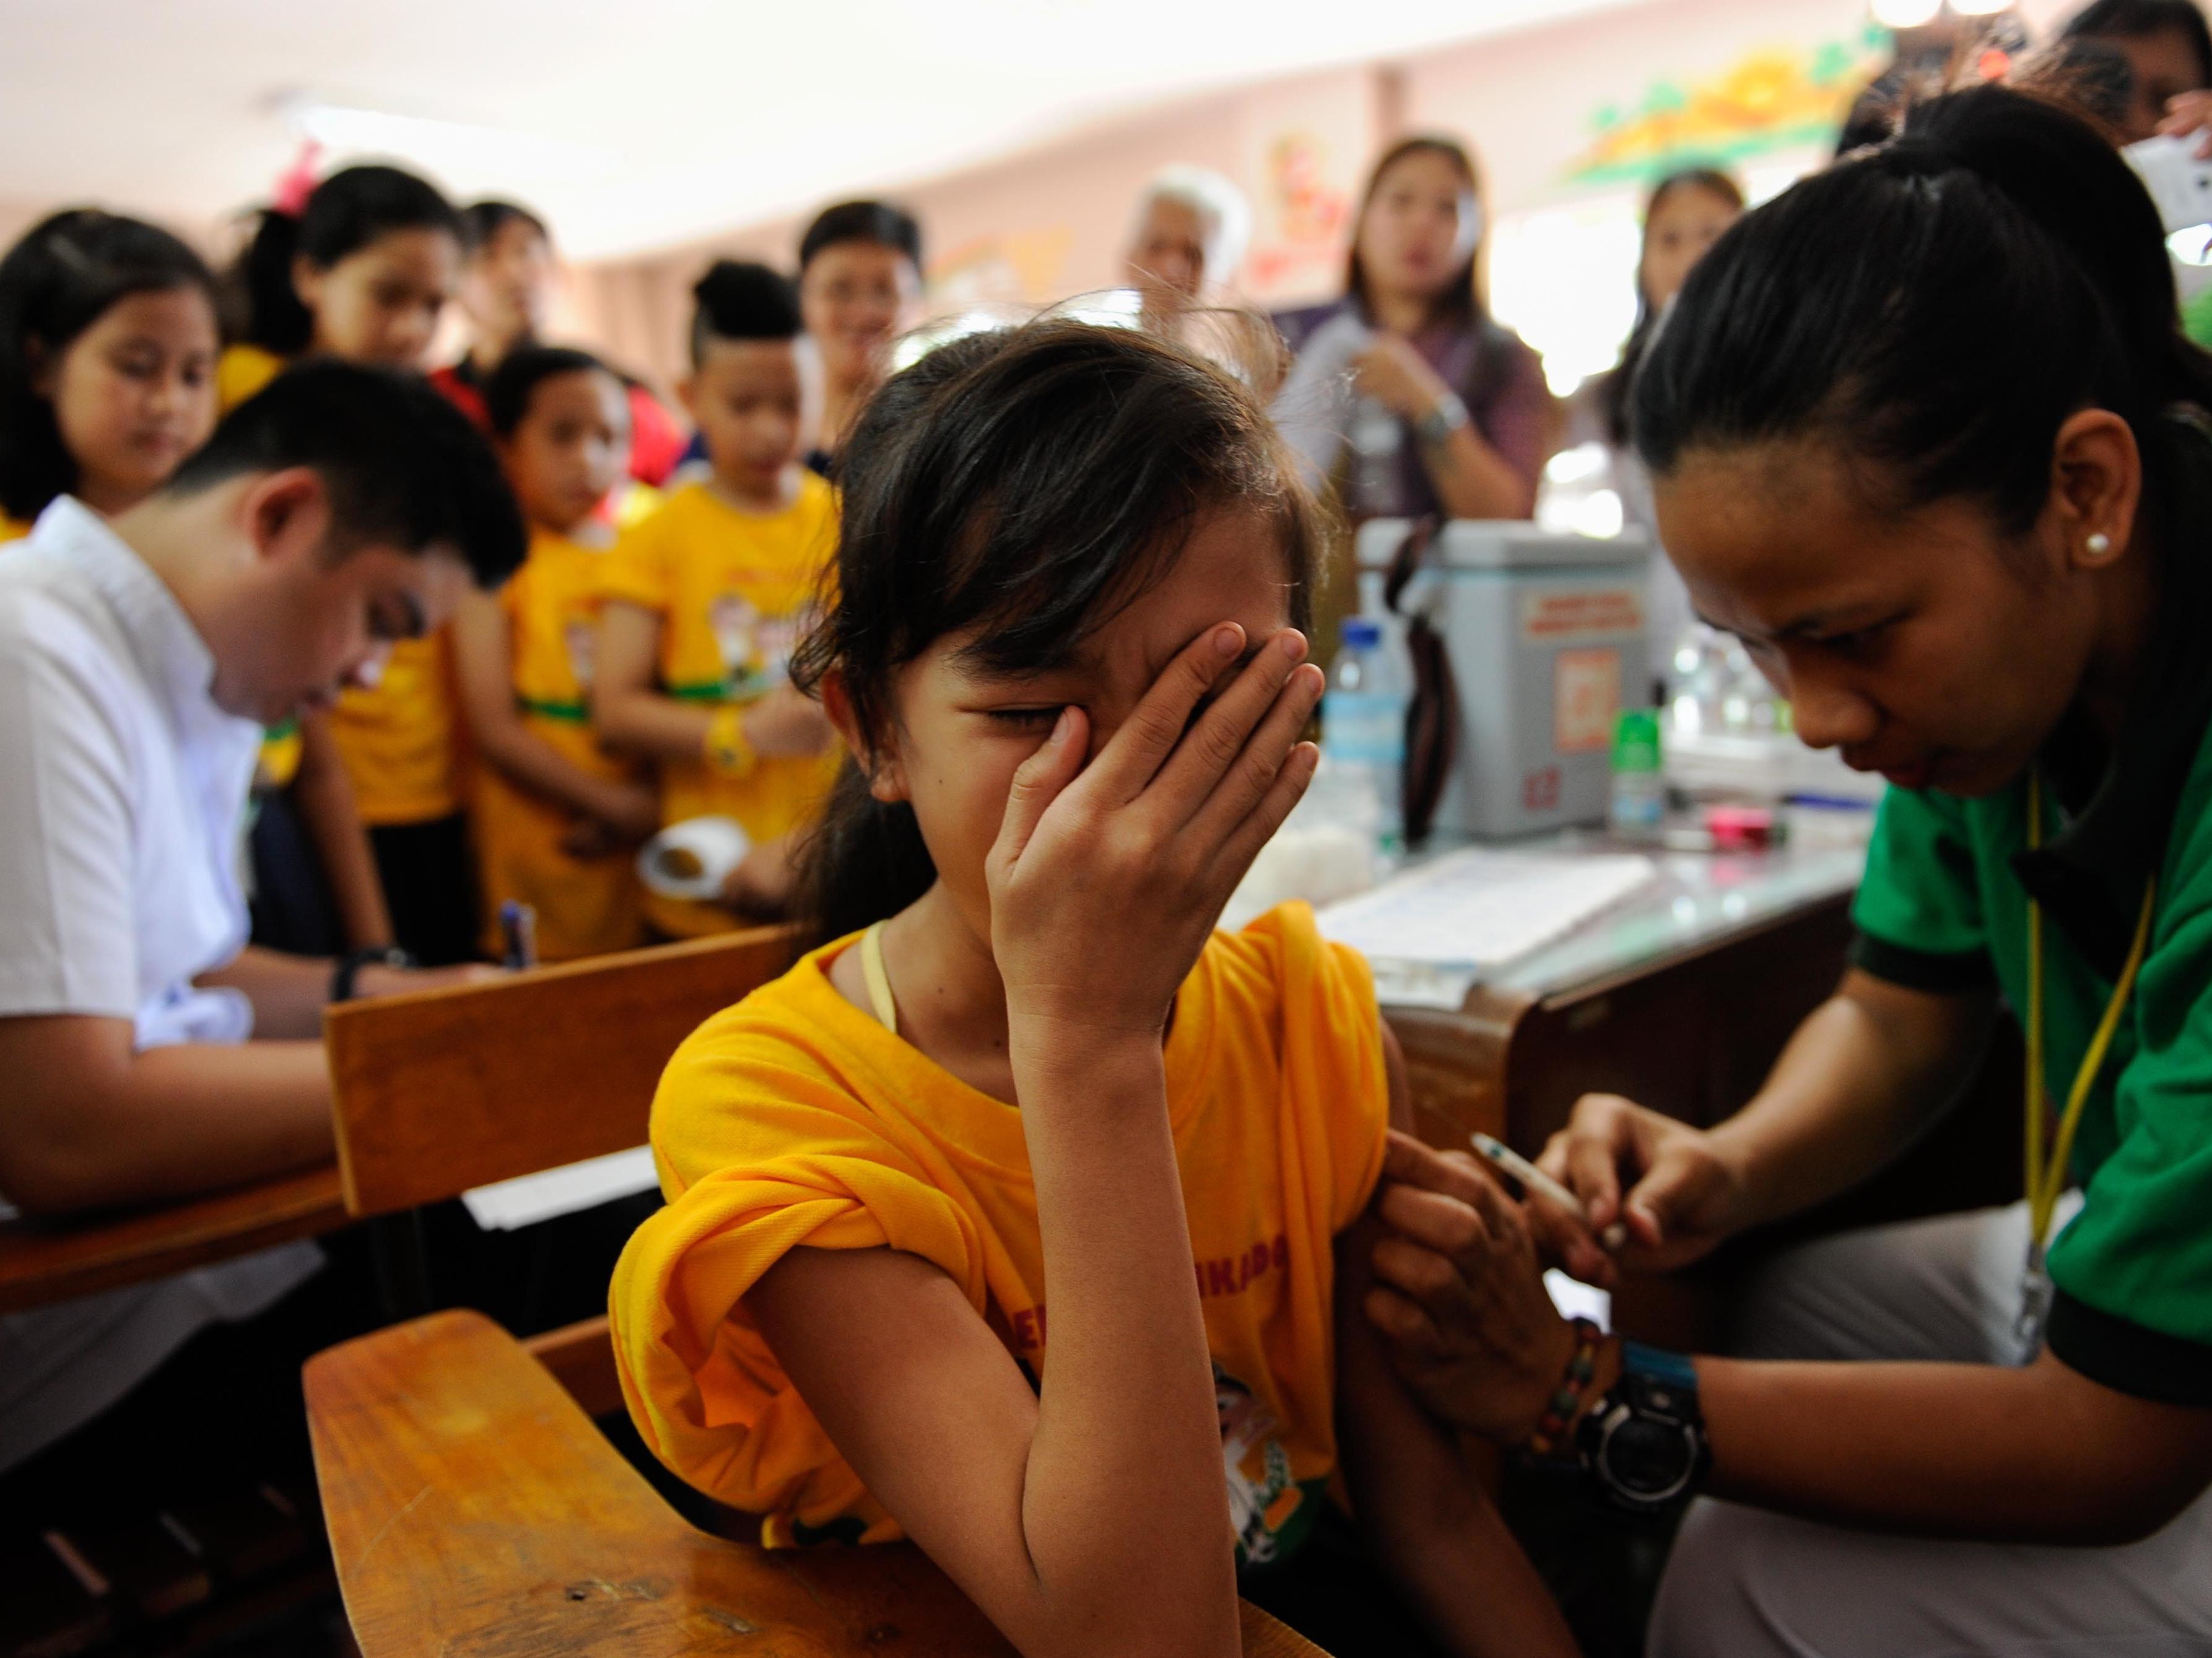 Brazil recommends restrictions on Sanofi dengue vaccine